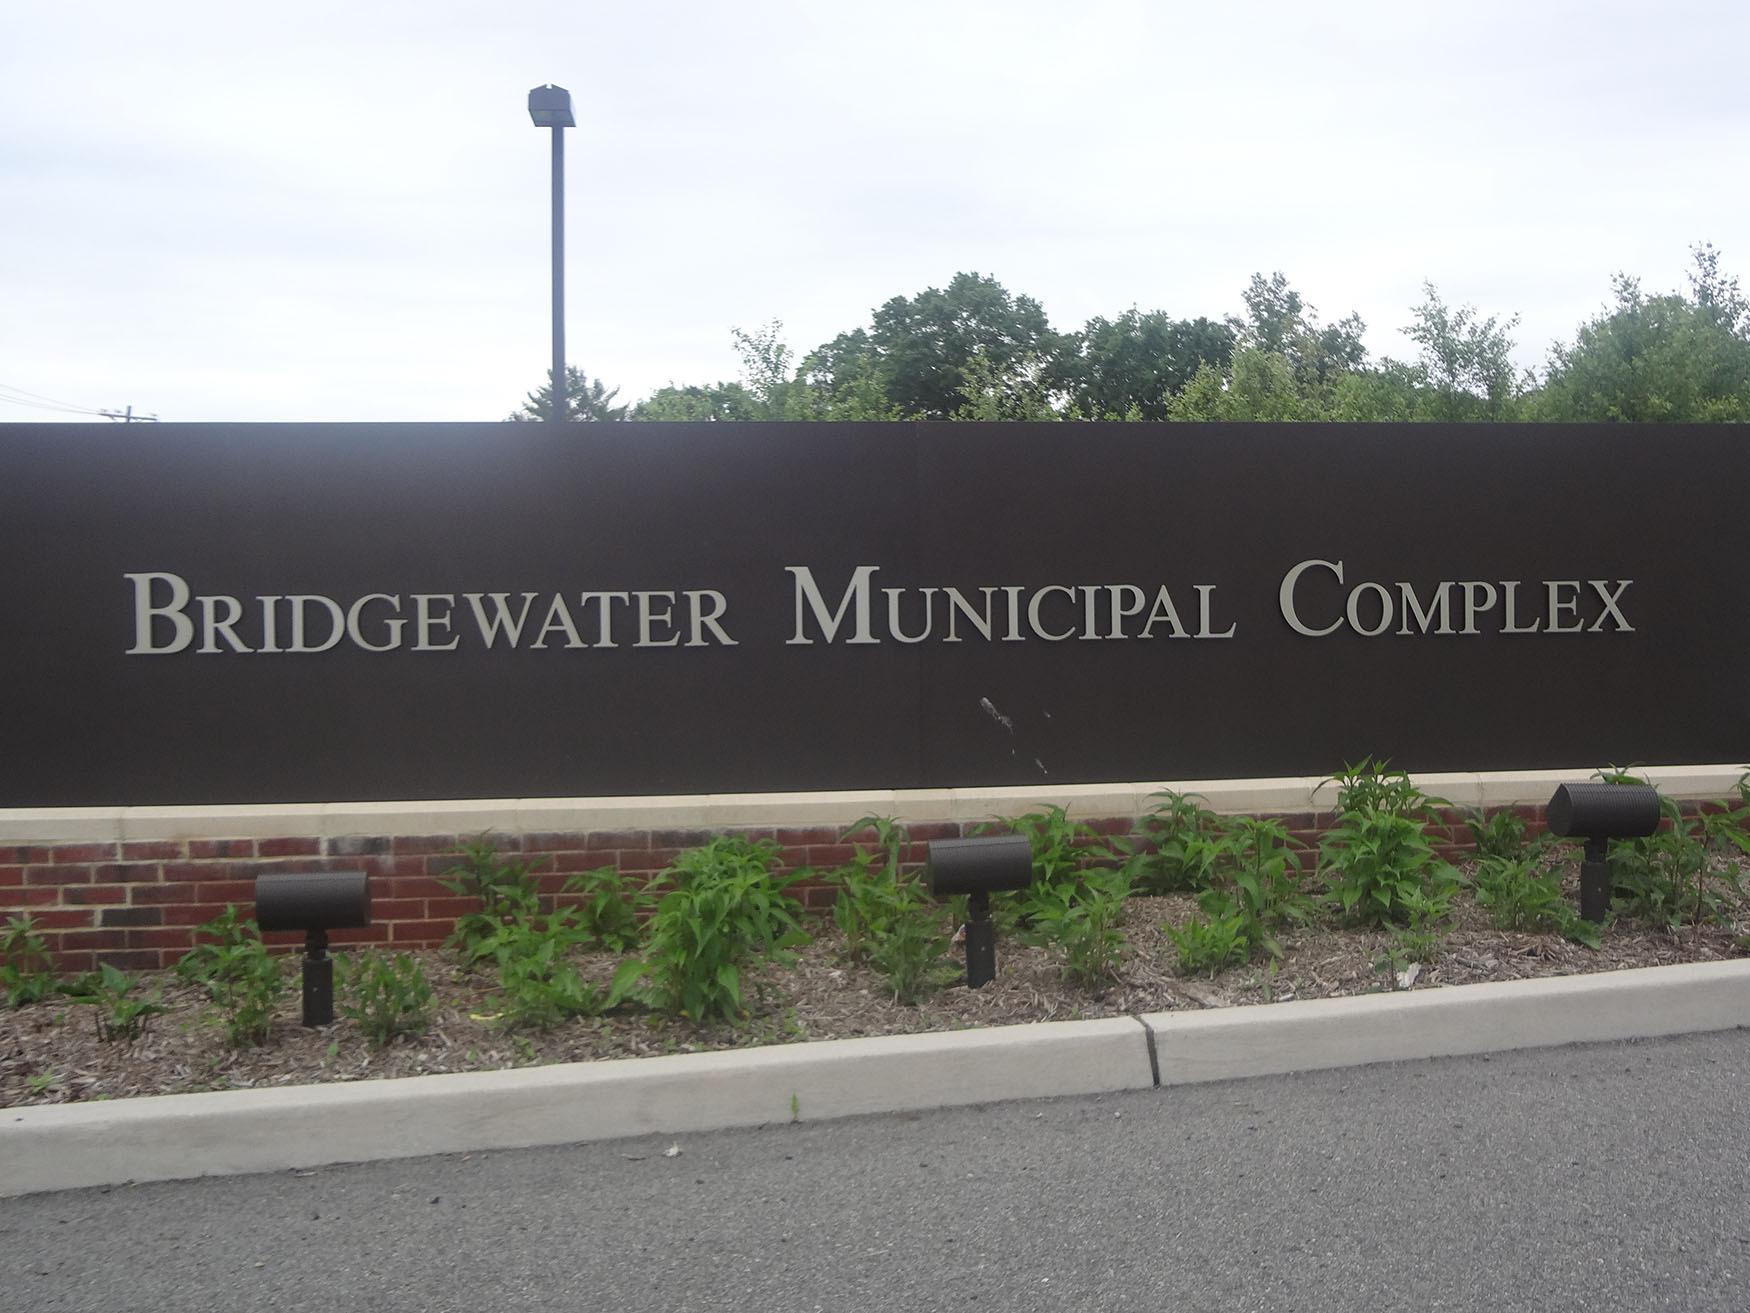 0c896fd159a2a2a8773f_Bridgewater_municipal.jpg